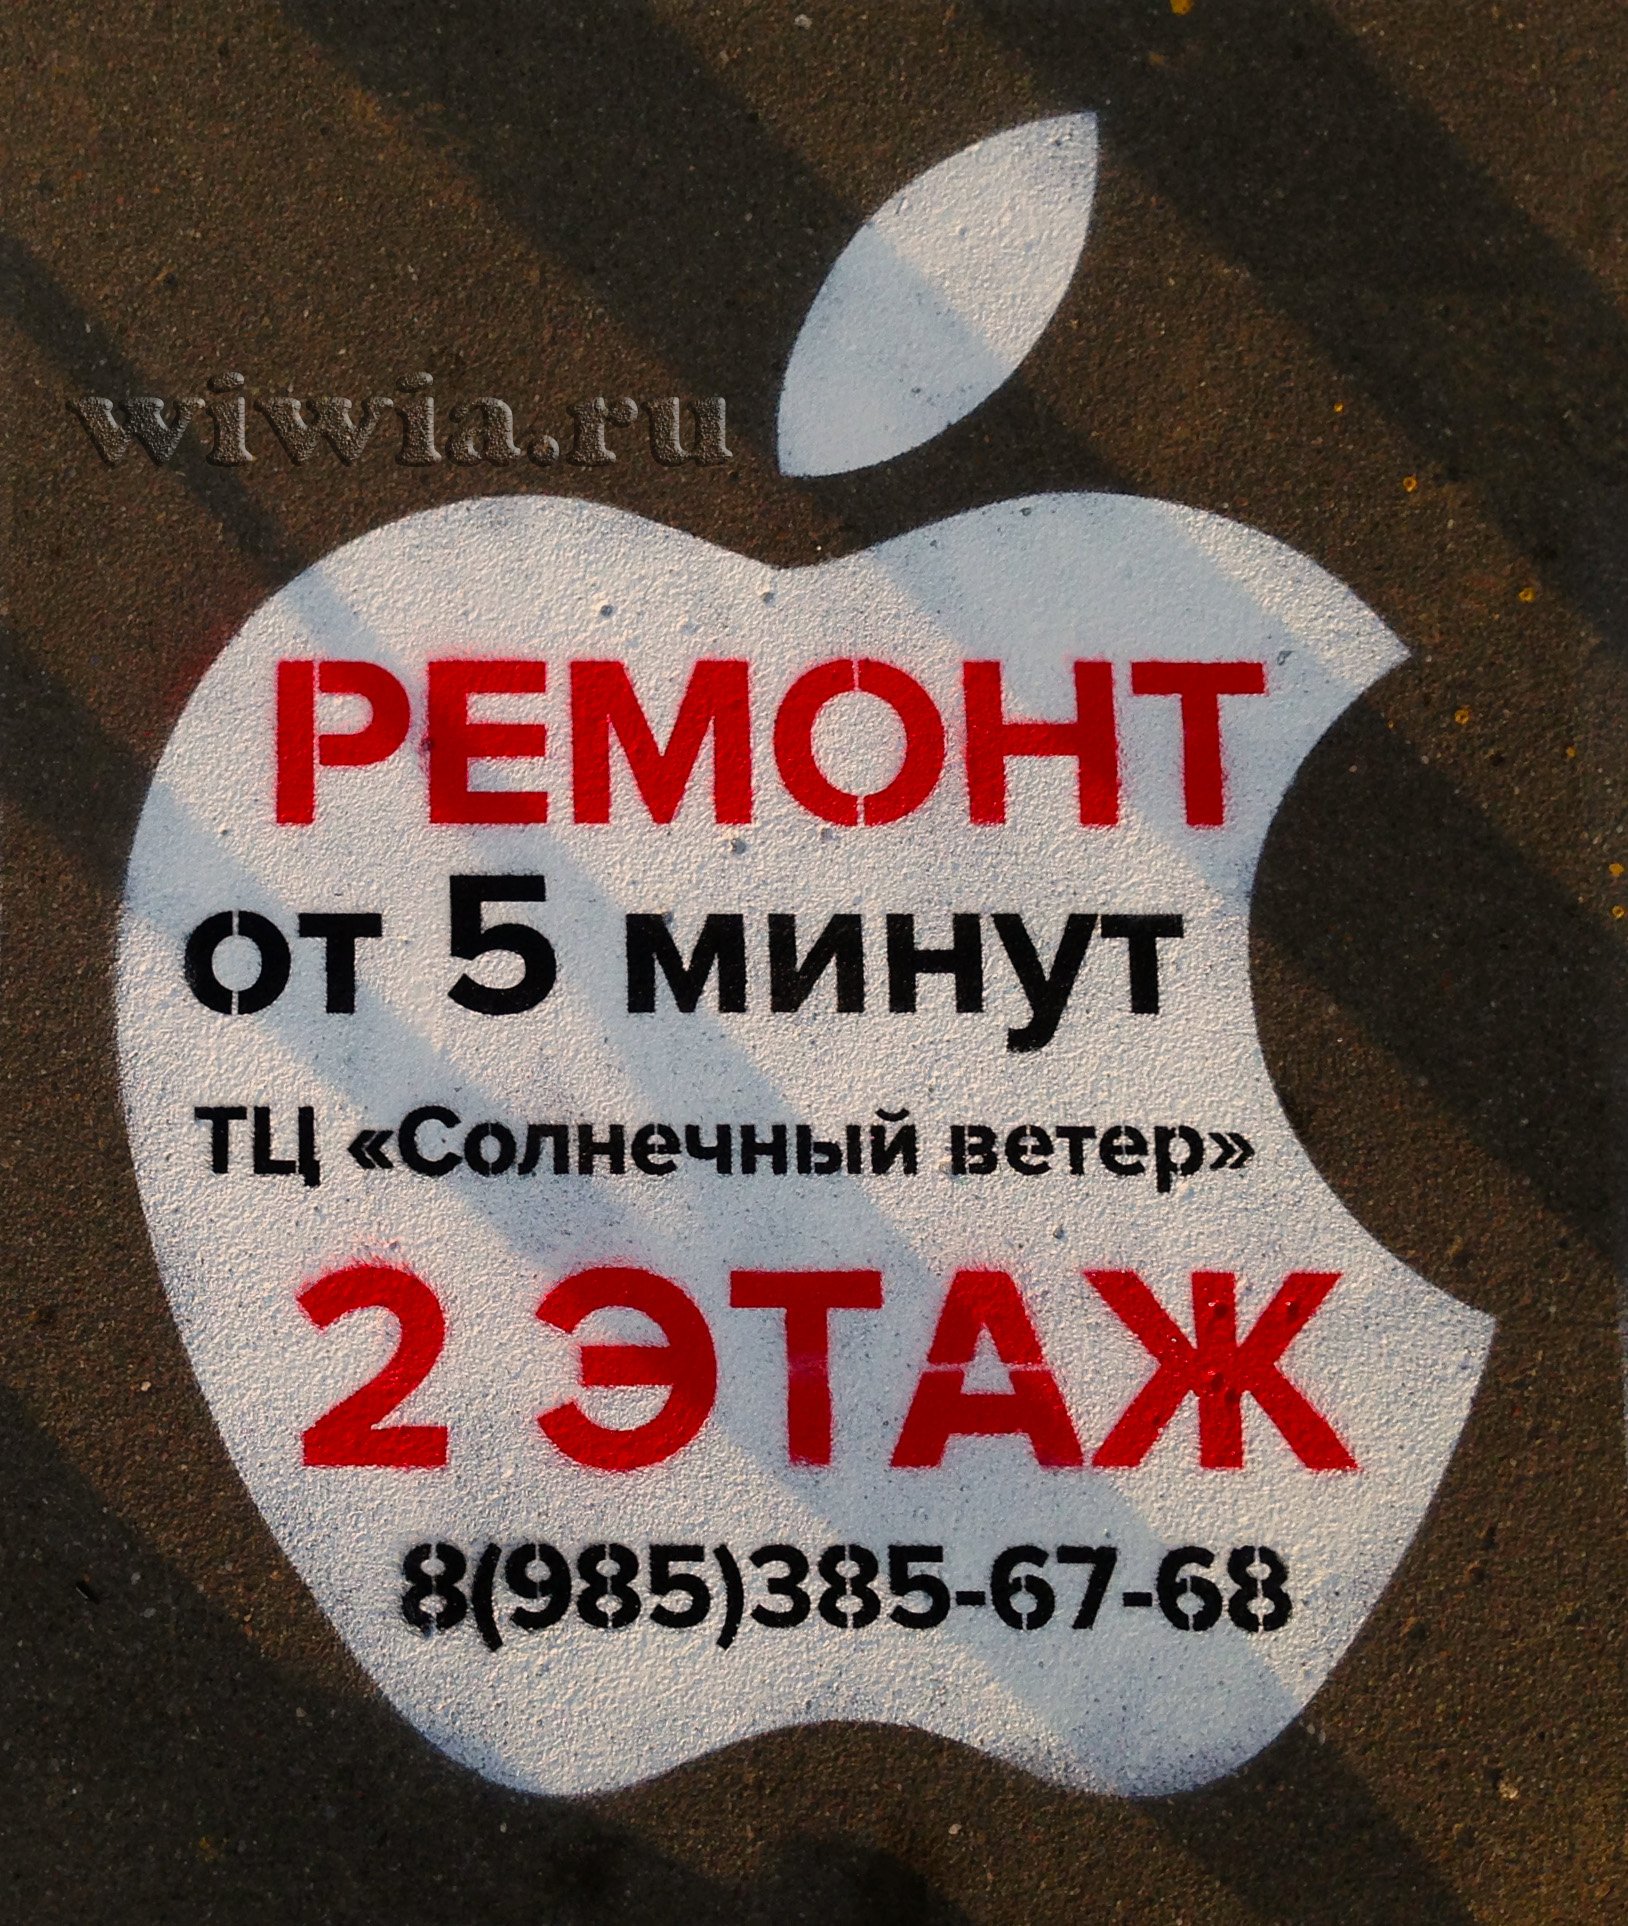 Реклама на асфальте. Сервис Apple.